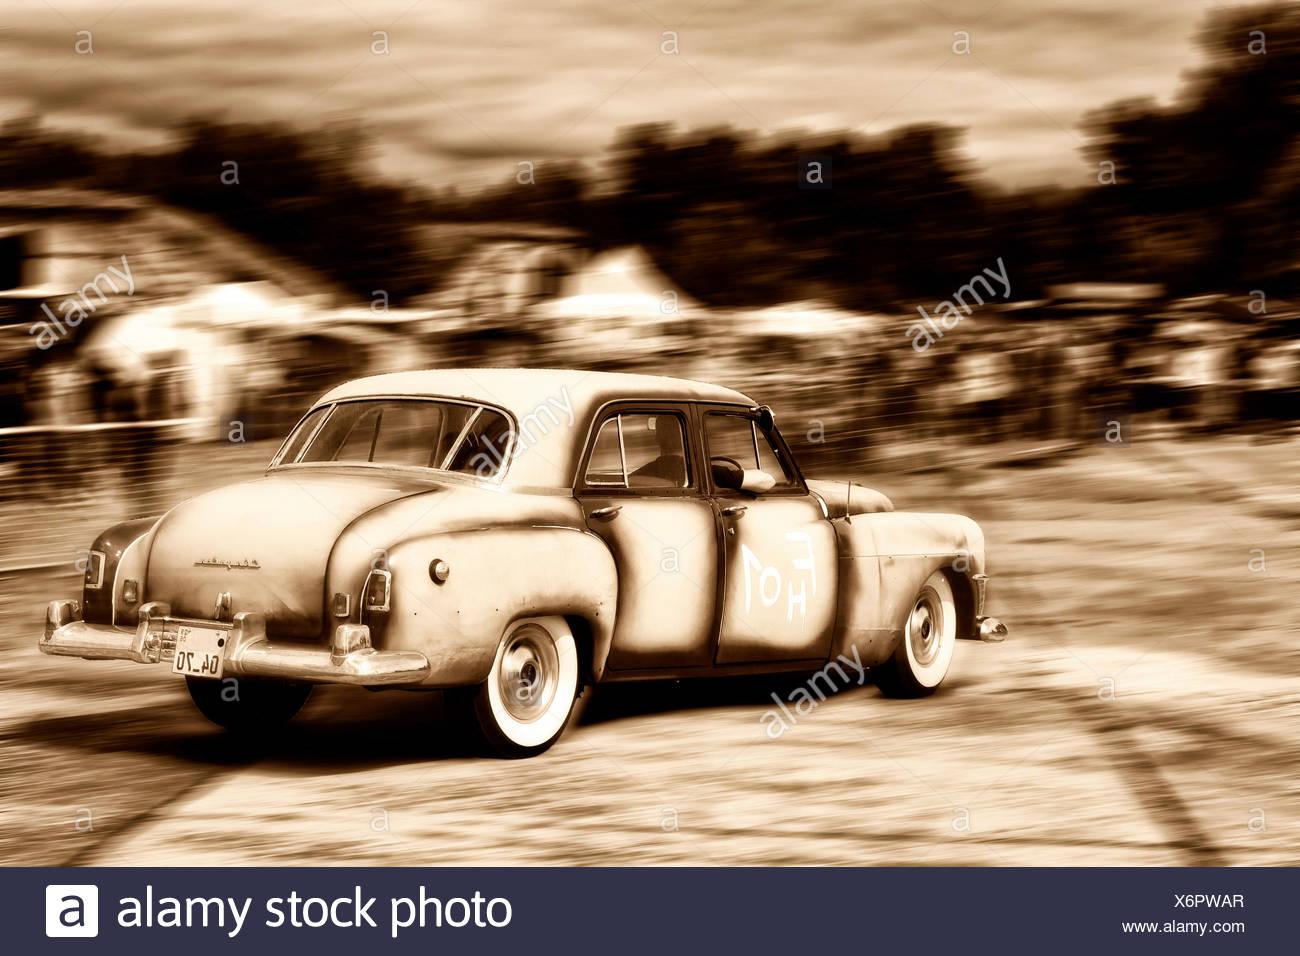 Chrysler classic car, Roadie Show, edited image, Berlin - Stock Image